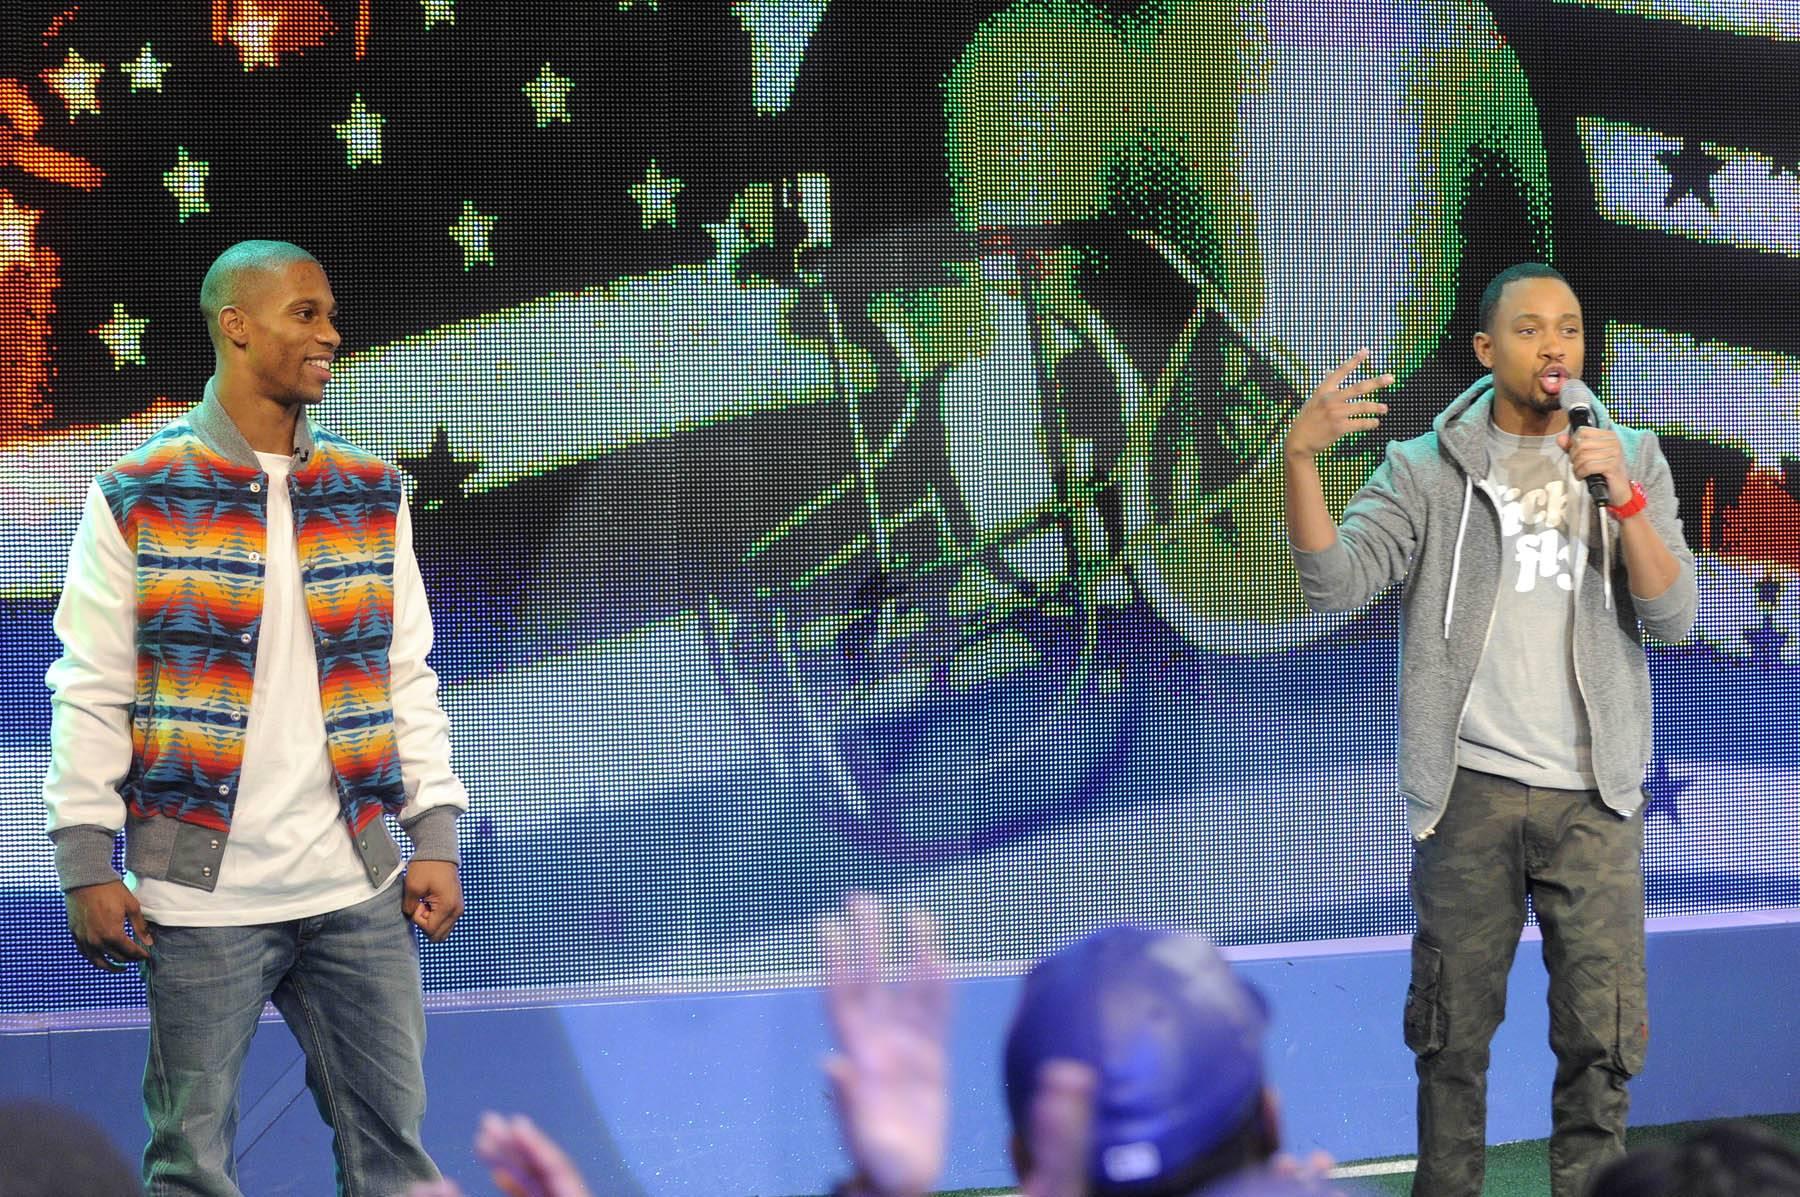 Get Set - Terrence J announces the salsa dance-off between Victor Cruz and Rocsi Diaz at 106 & Park, January 26, 2012. (Photo: John Ricard / BET)